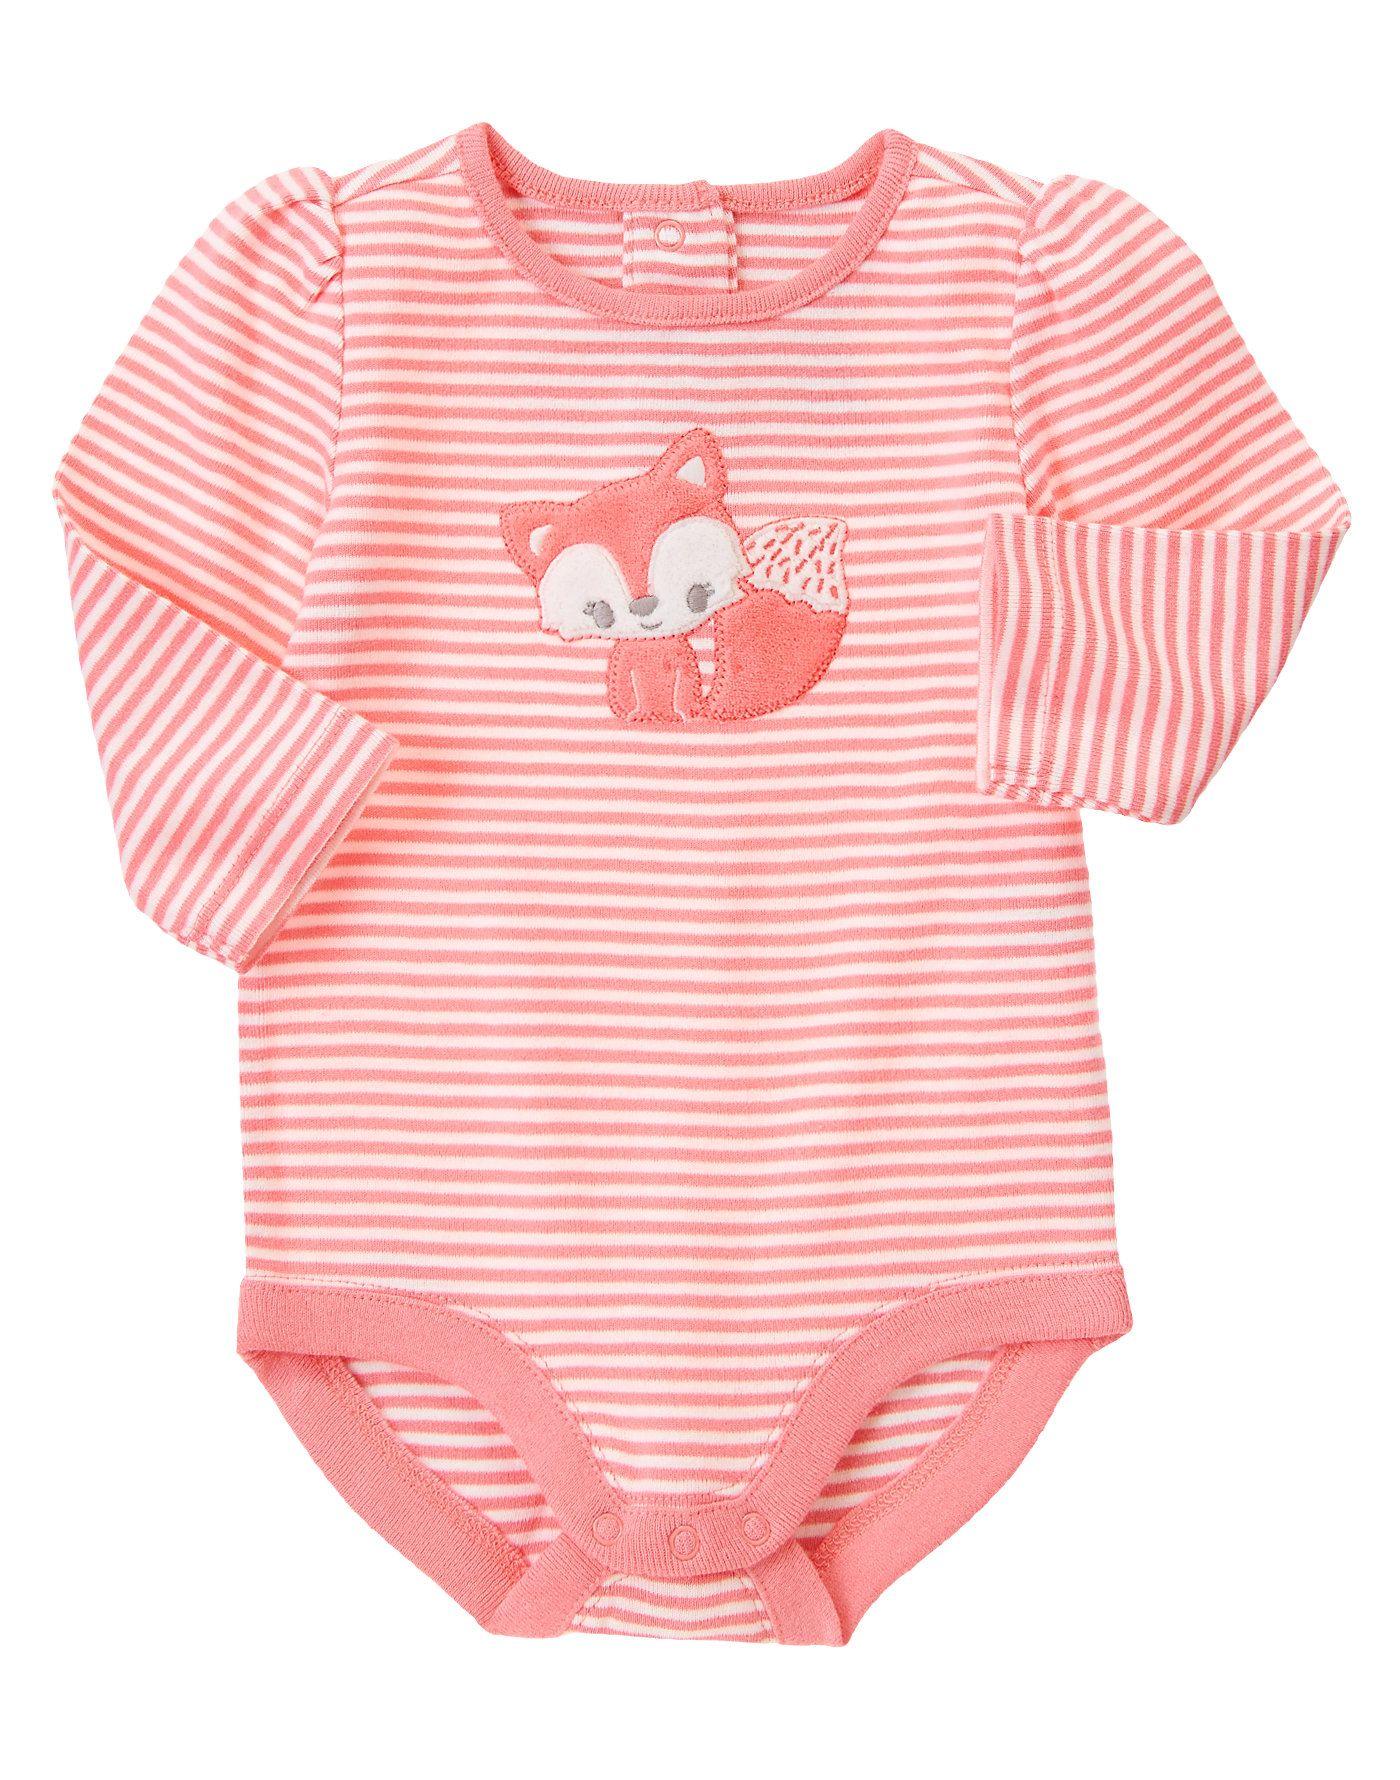 Baby Fox Bodysuit at Gymboree (Gymboree 0-24m) | Baby clothes ...